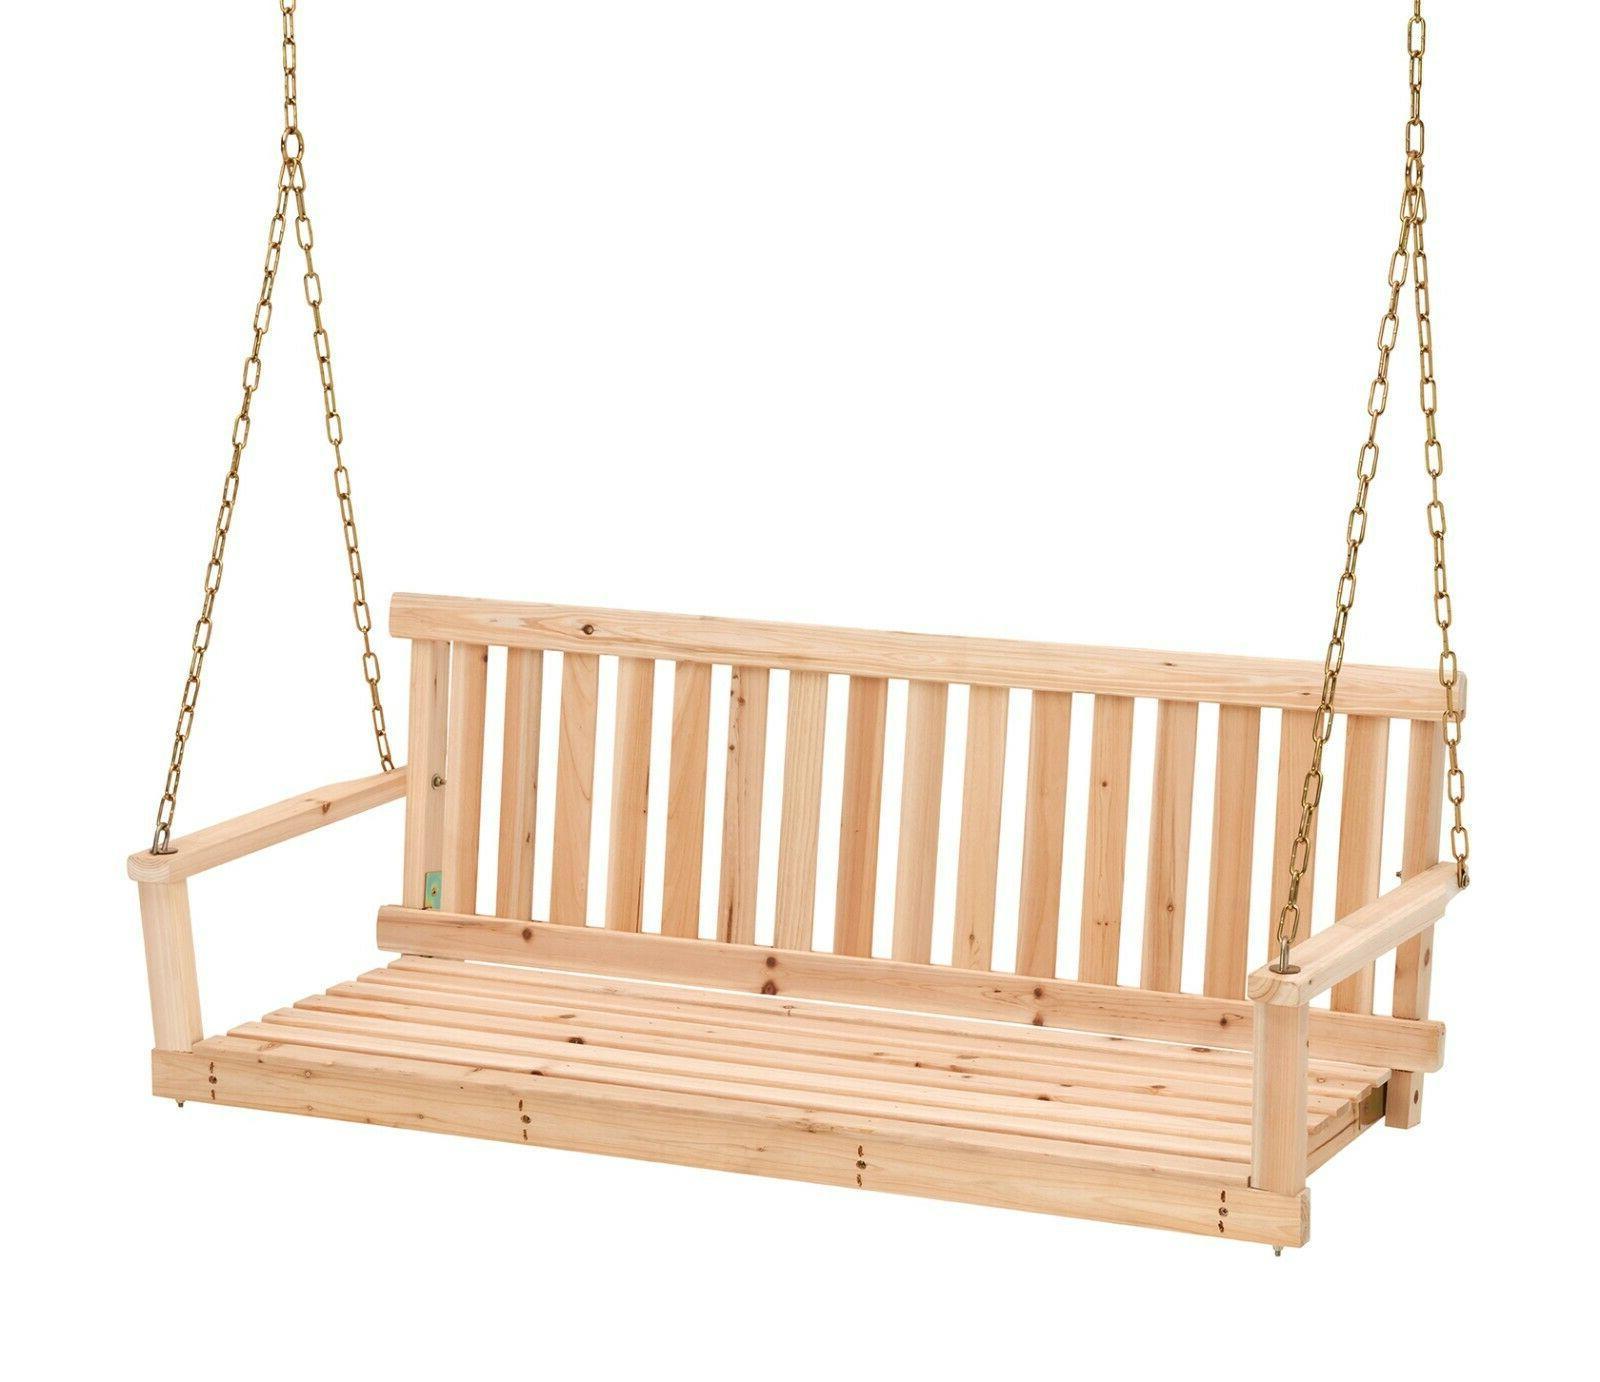 h 24 jennings 4 swing seat chair